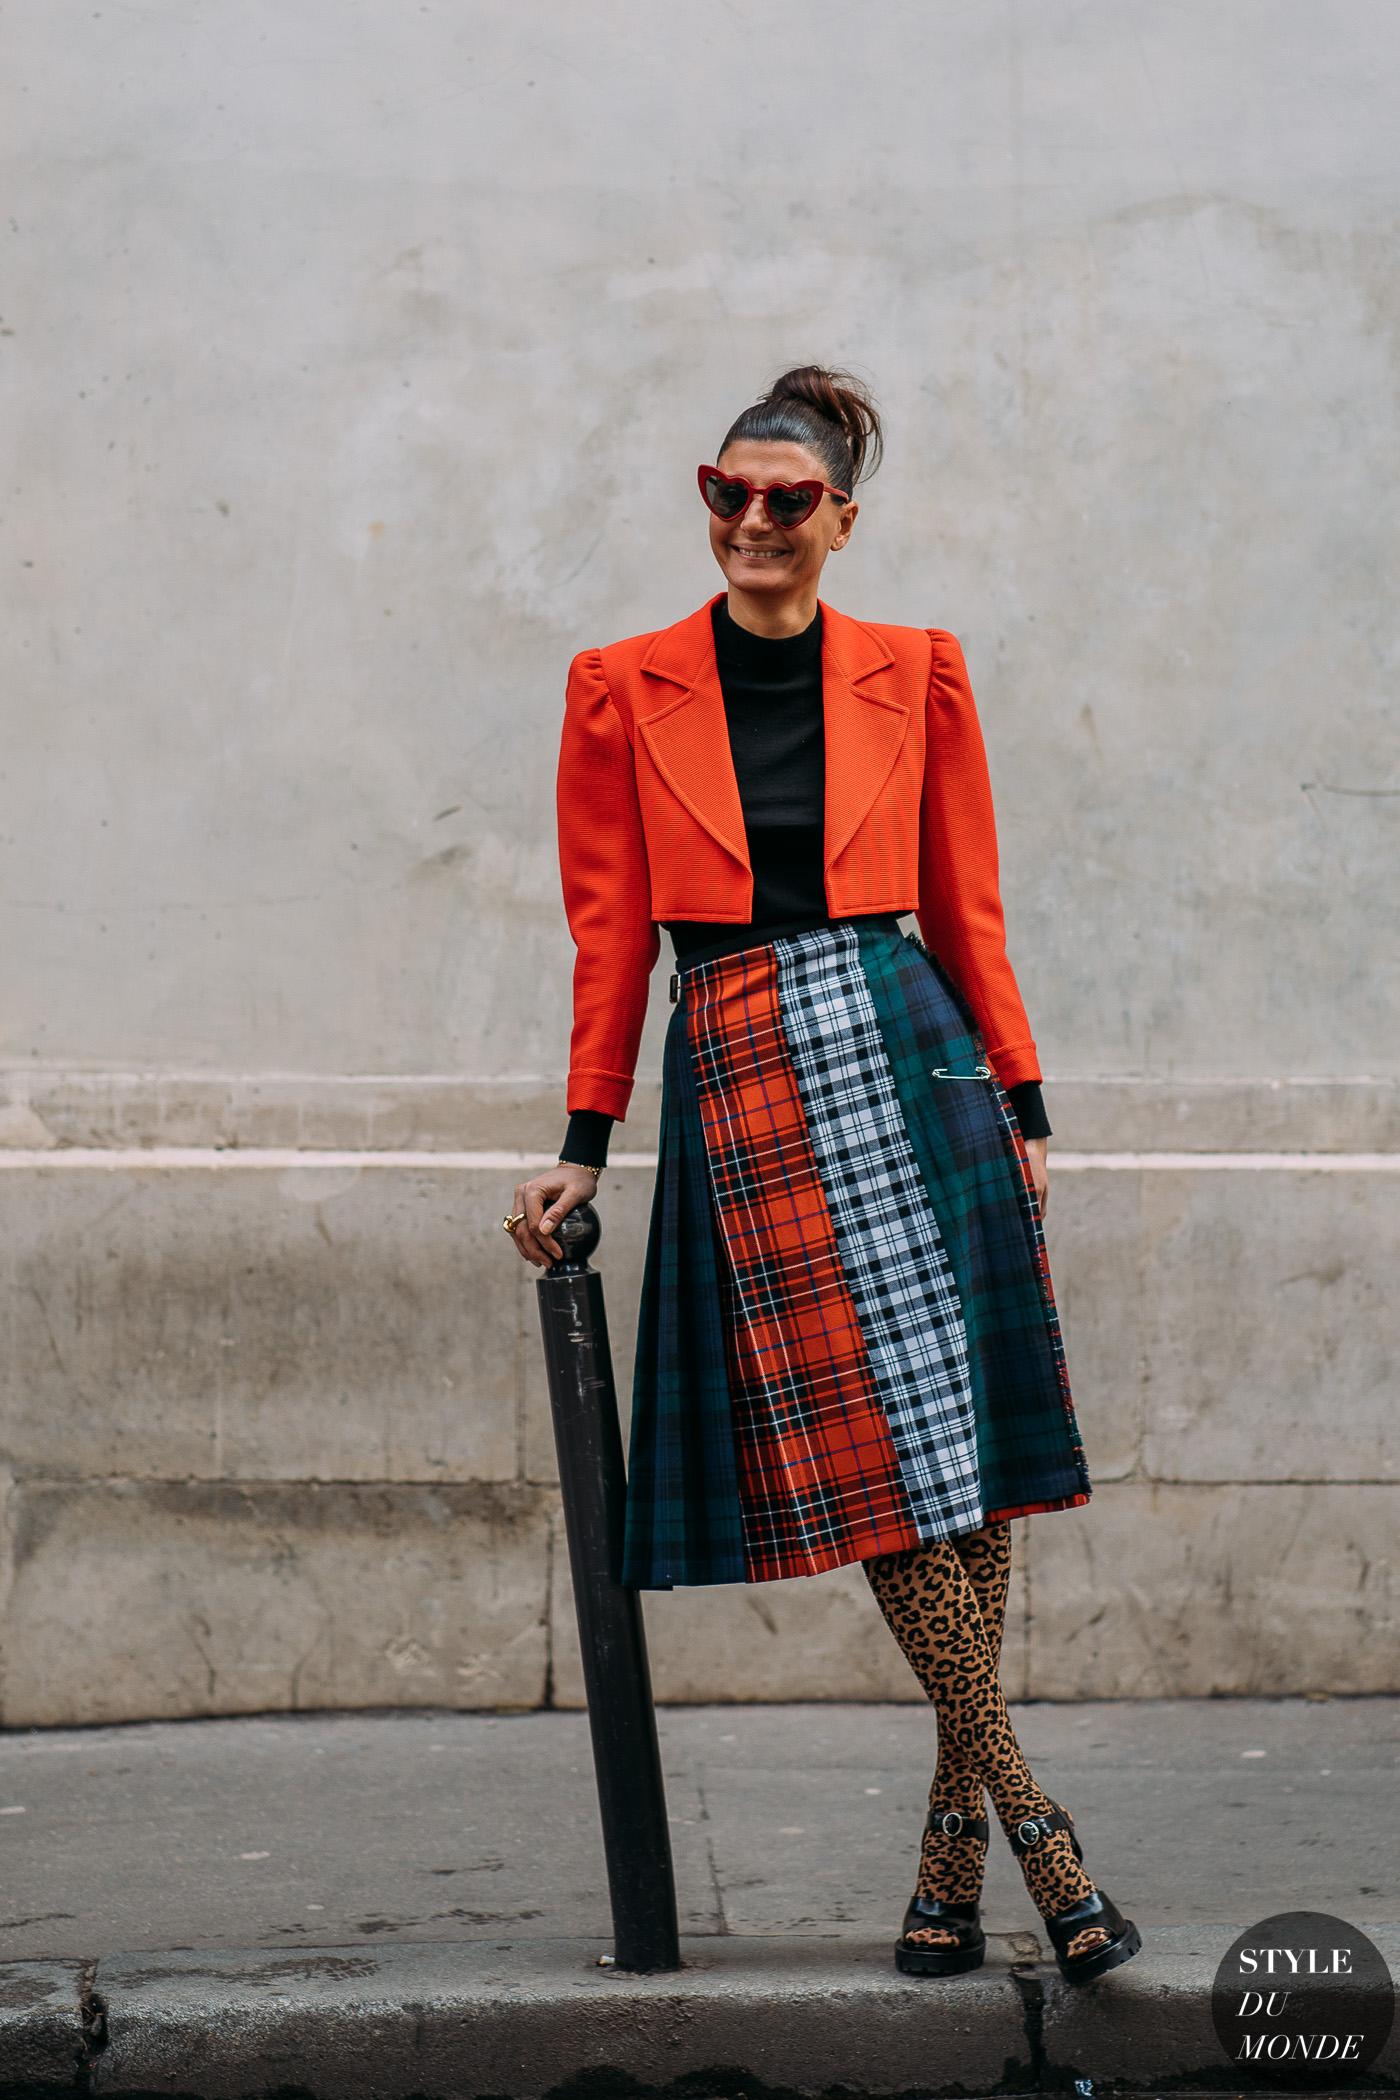 Giovanna-Battaglia-by-STYLEDUMONDE-Street-Style-Fashion-Photography-FW18-20180306_48A0523